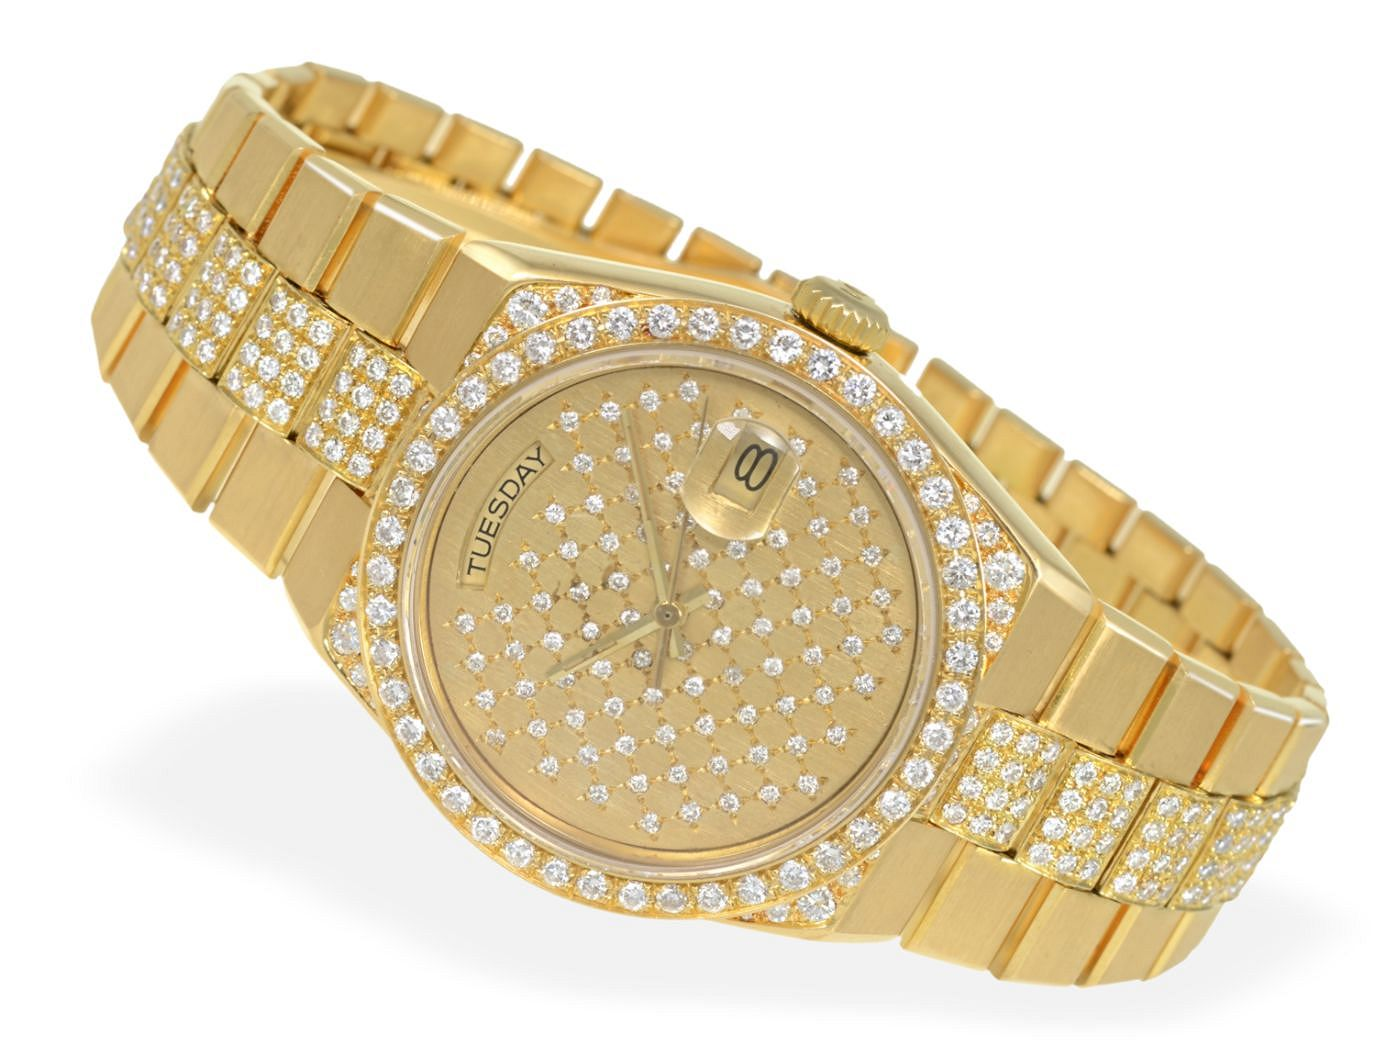 Wristwatch: luxurious heavy gold gentlemen's watch with diamonds, Rolex Day-Date ref. 19018-